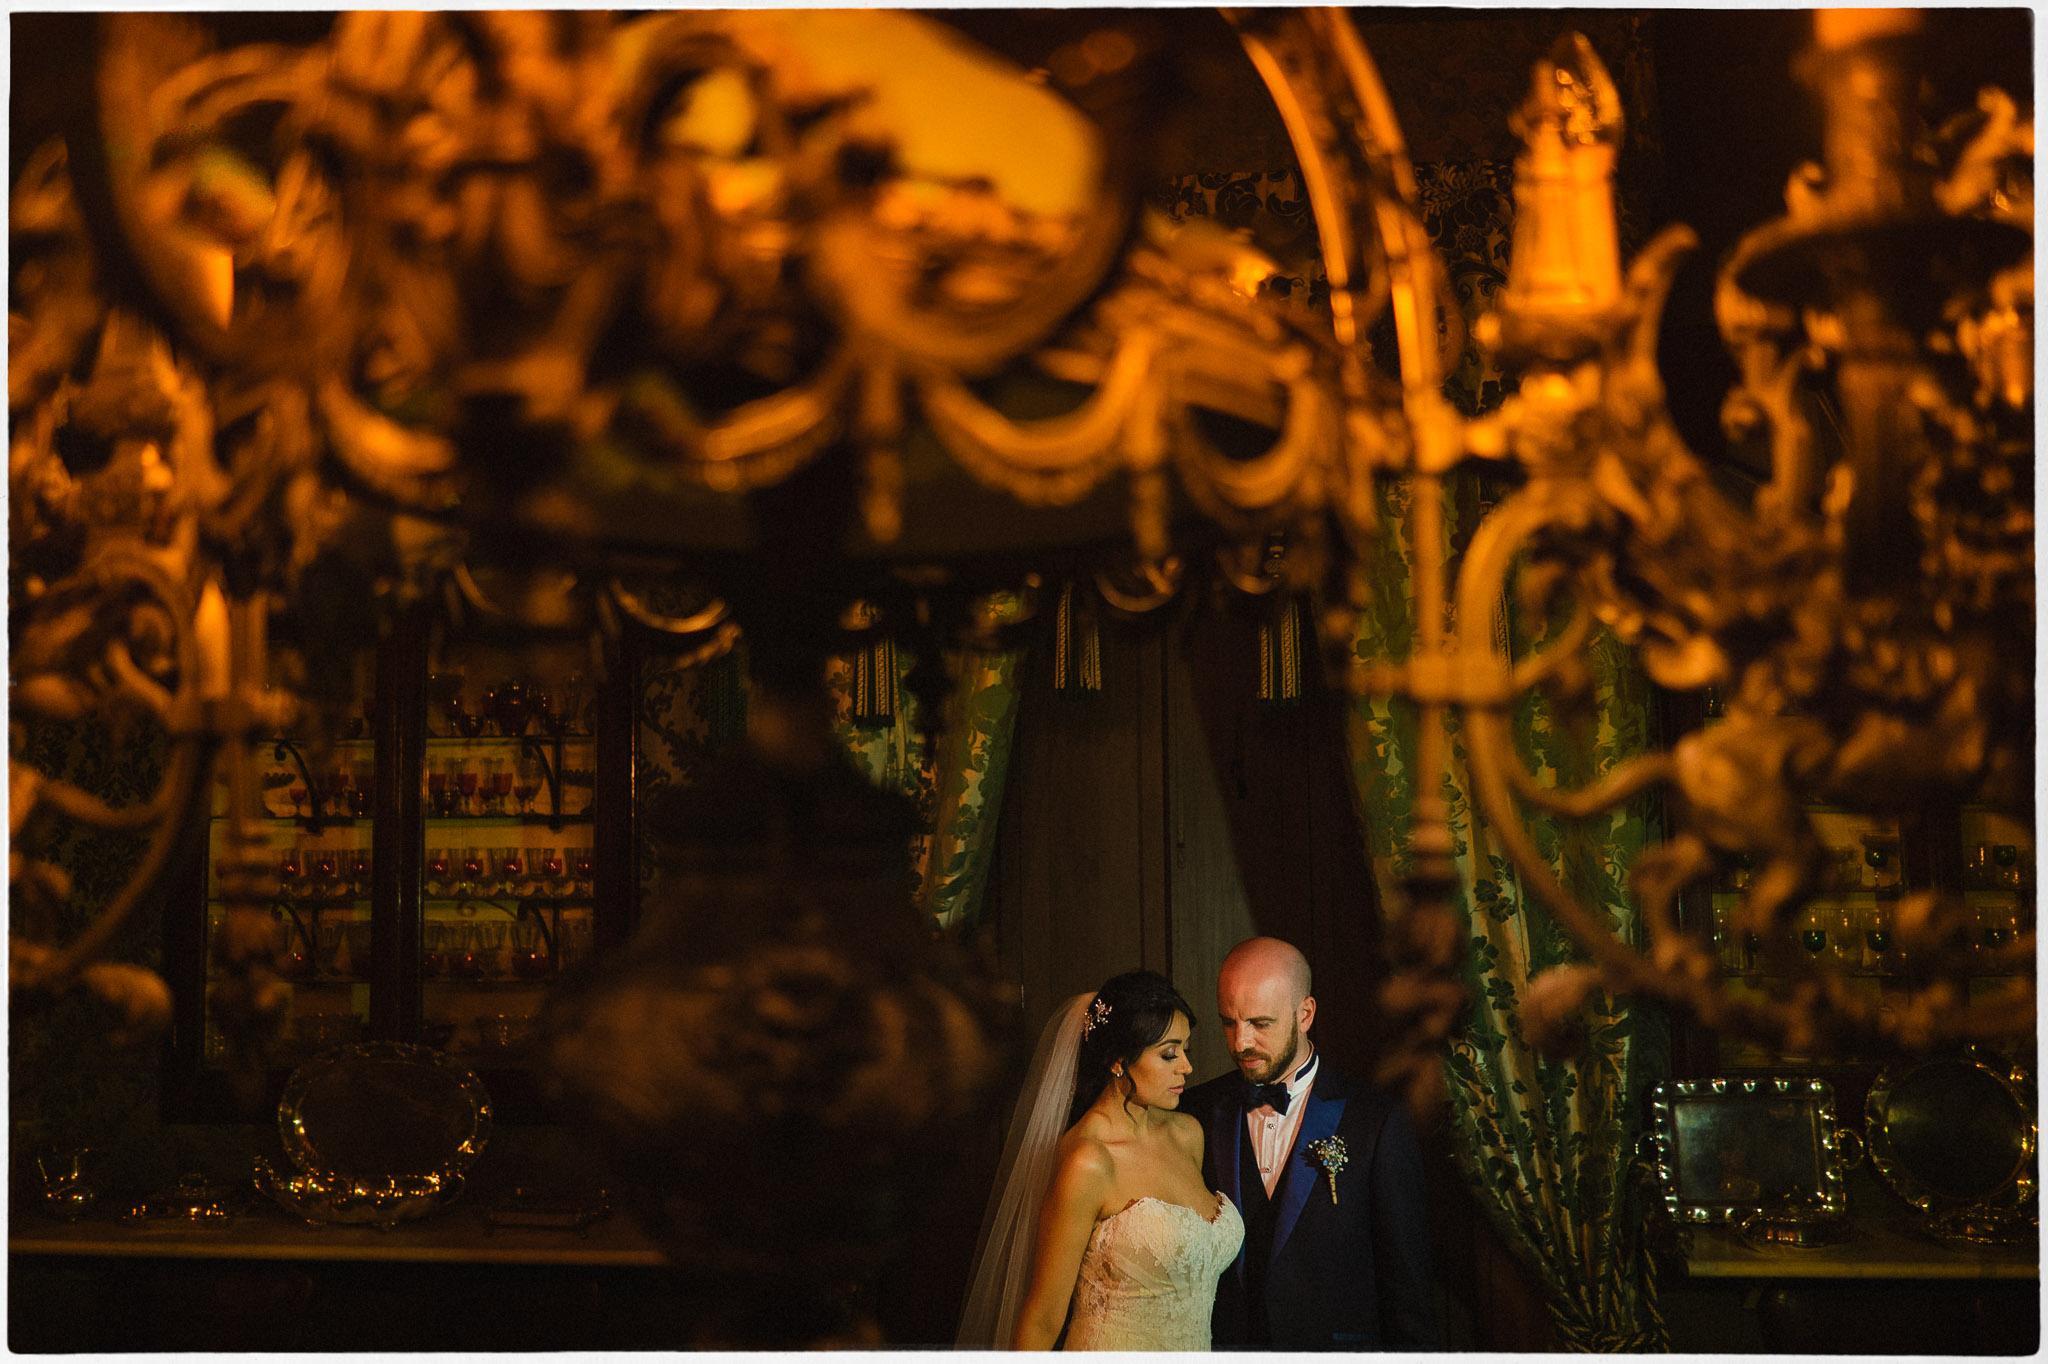 ©www.mauriziosolisbroca.com-20161001maurizio-solis-broca-mexico-canada-wedding-photographer20161001DSC08077-Edit.jpg